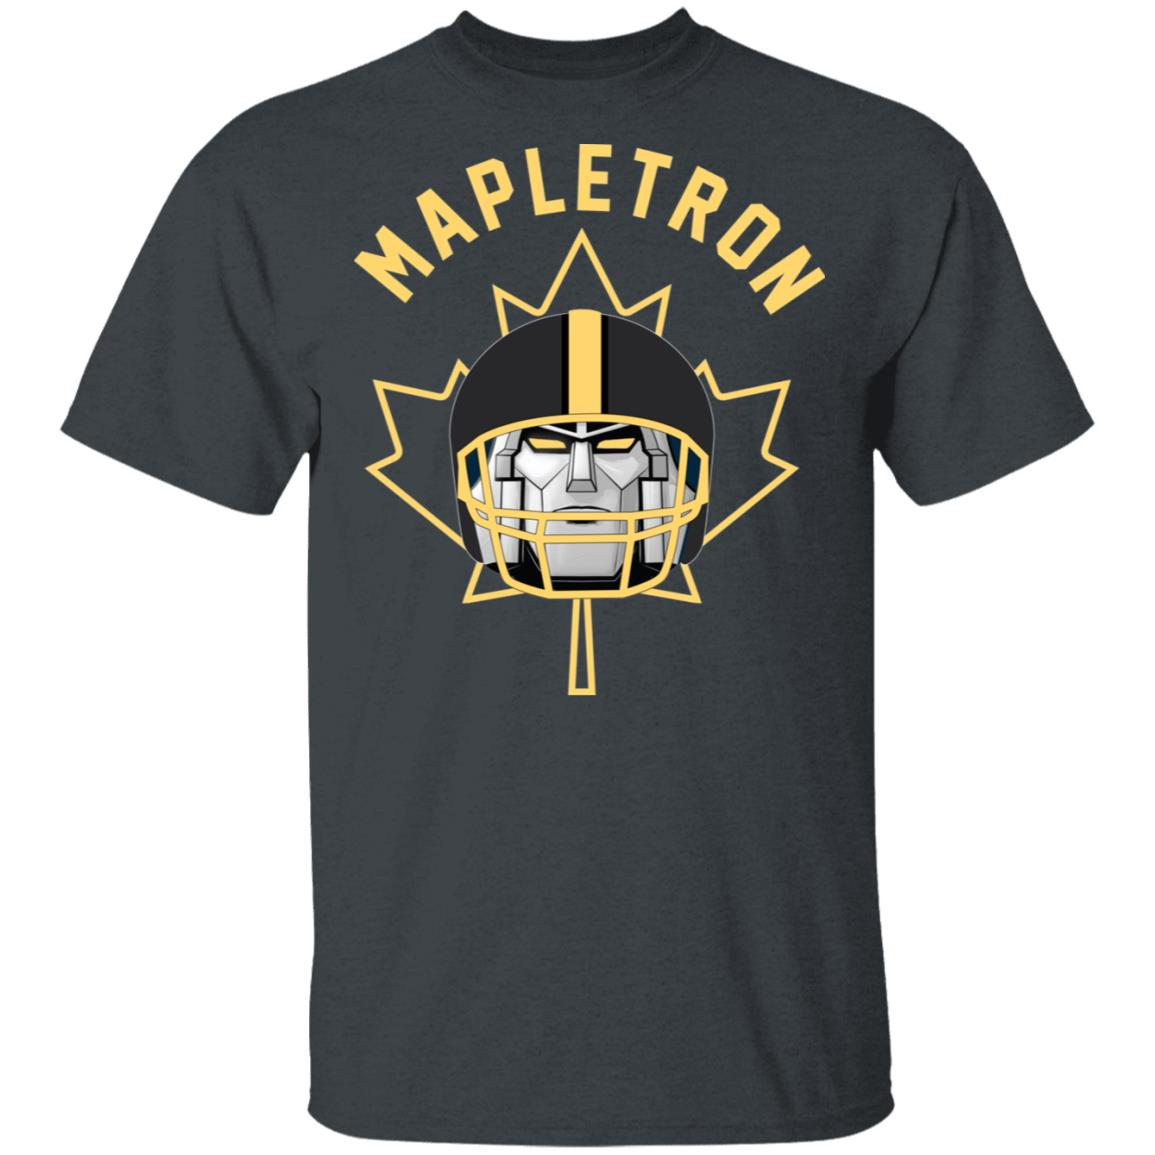 Mapletron Shirt